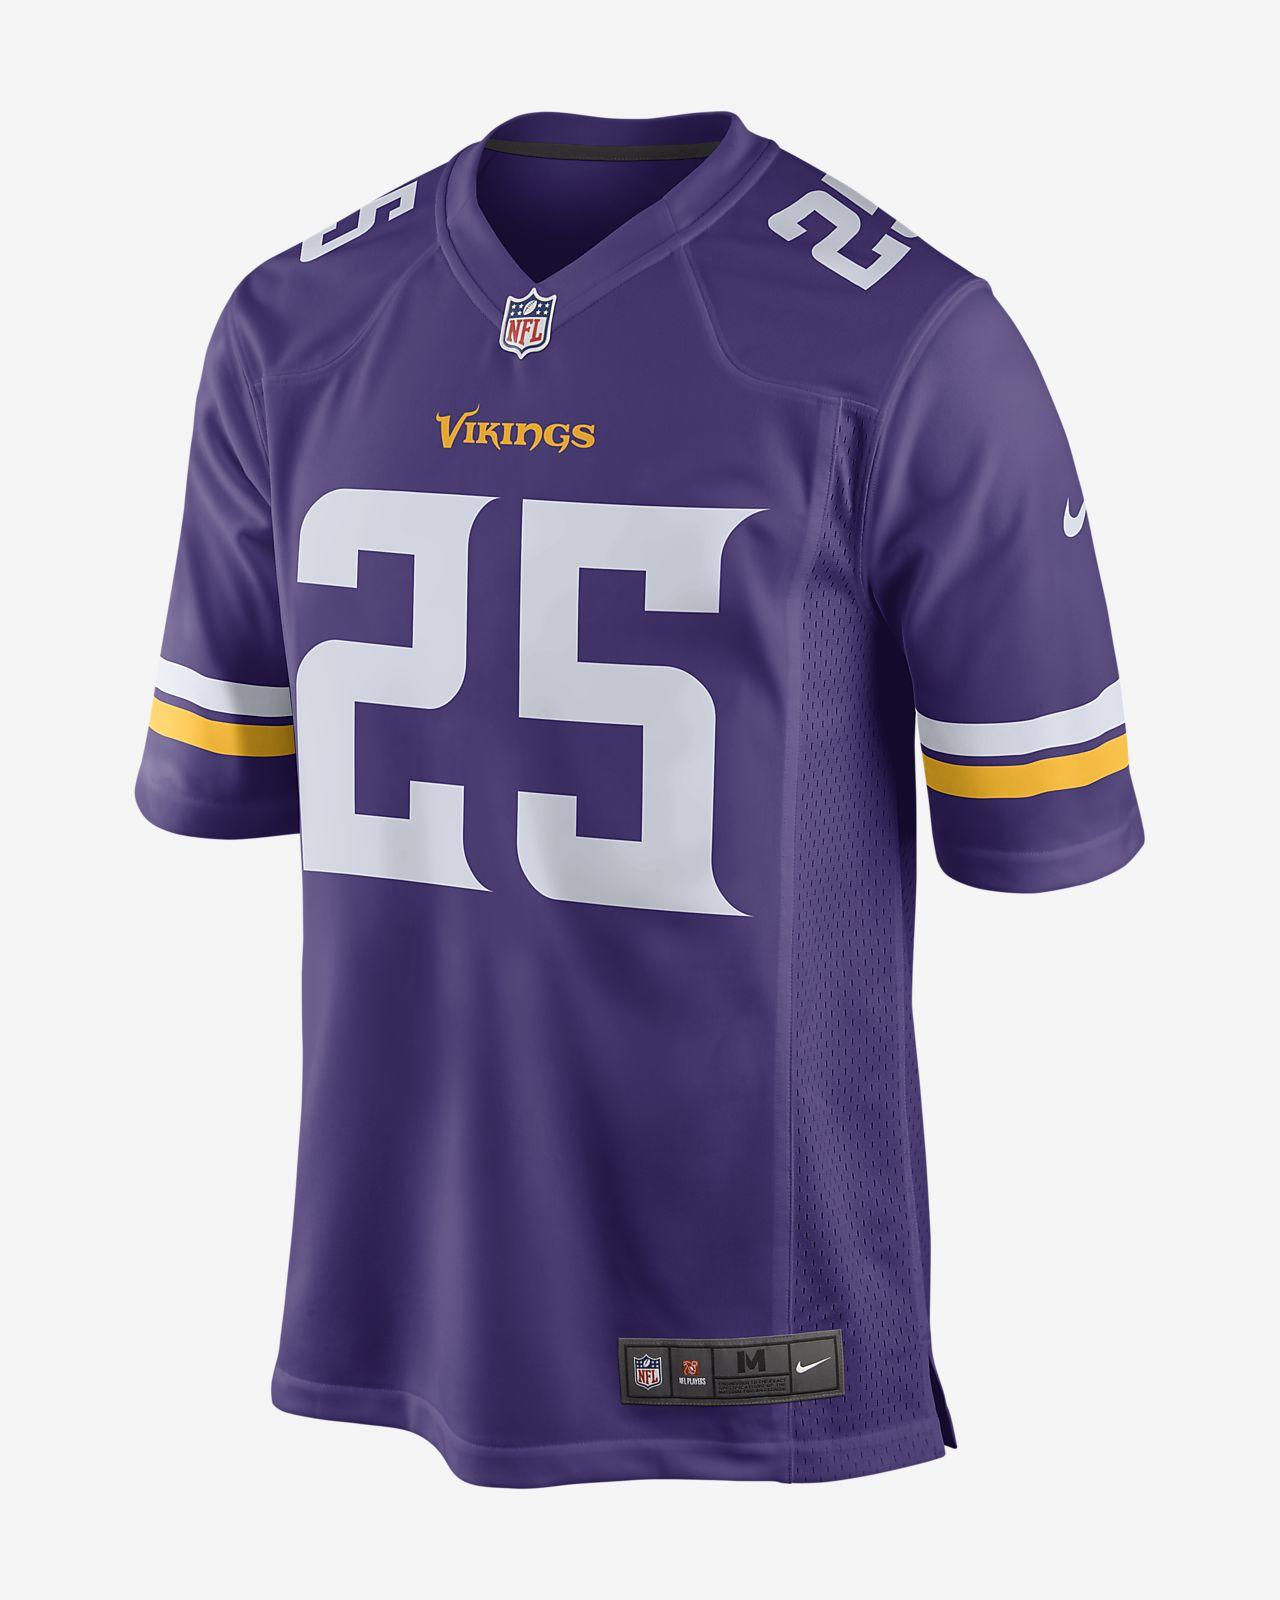 Américain Nfl Minnesota Vikings Football Maillot Domicile De nO08kwP